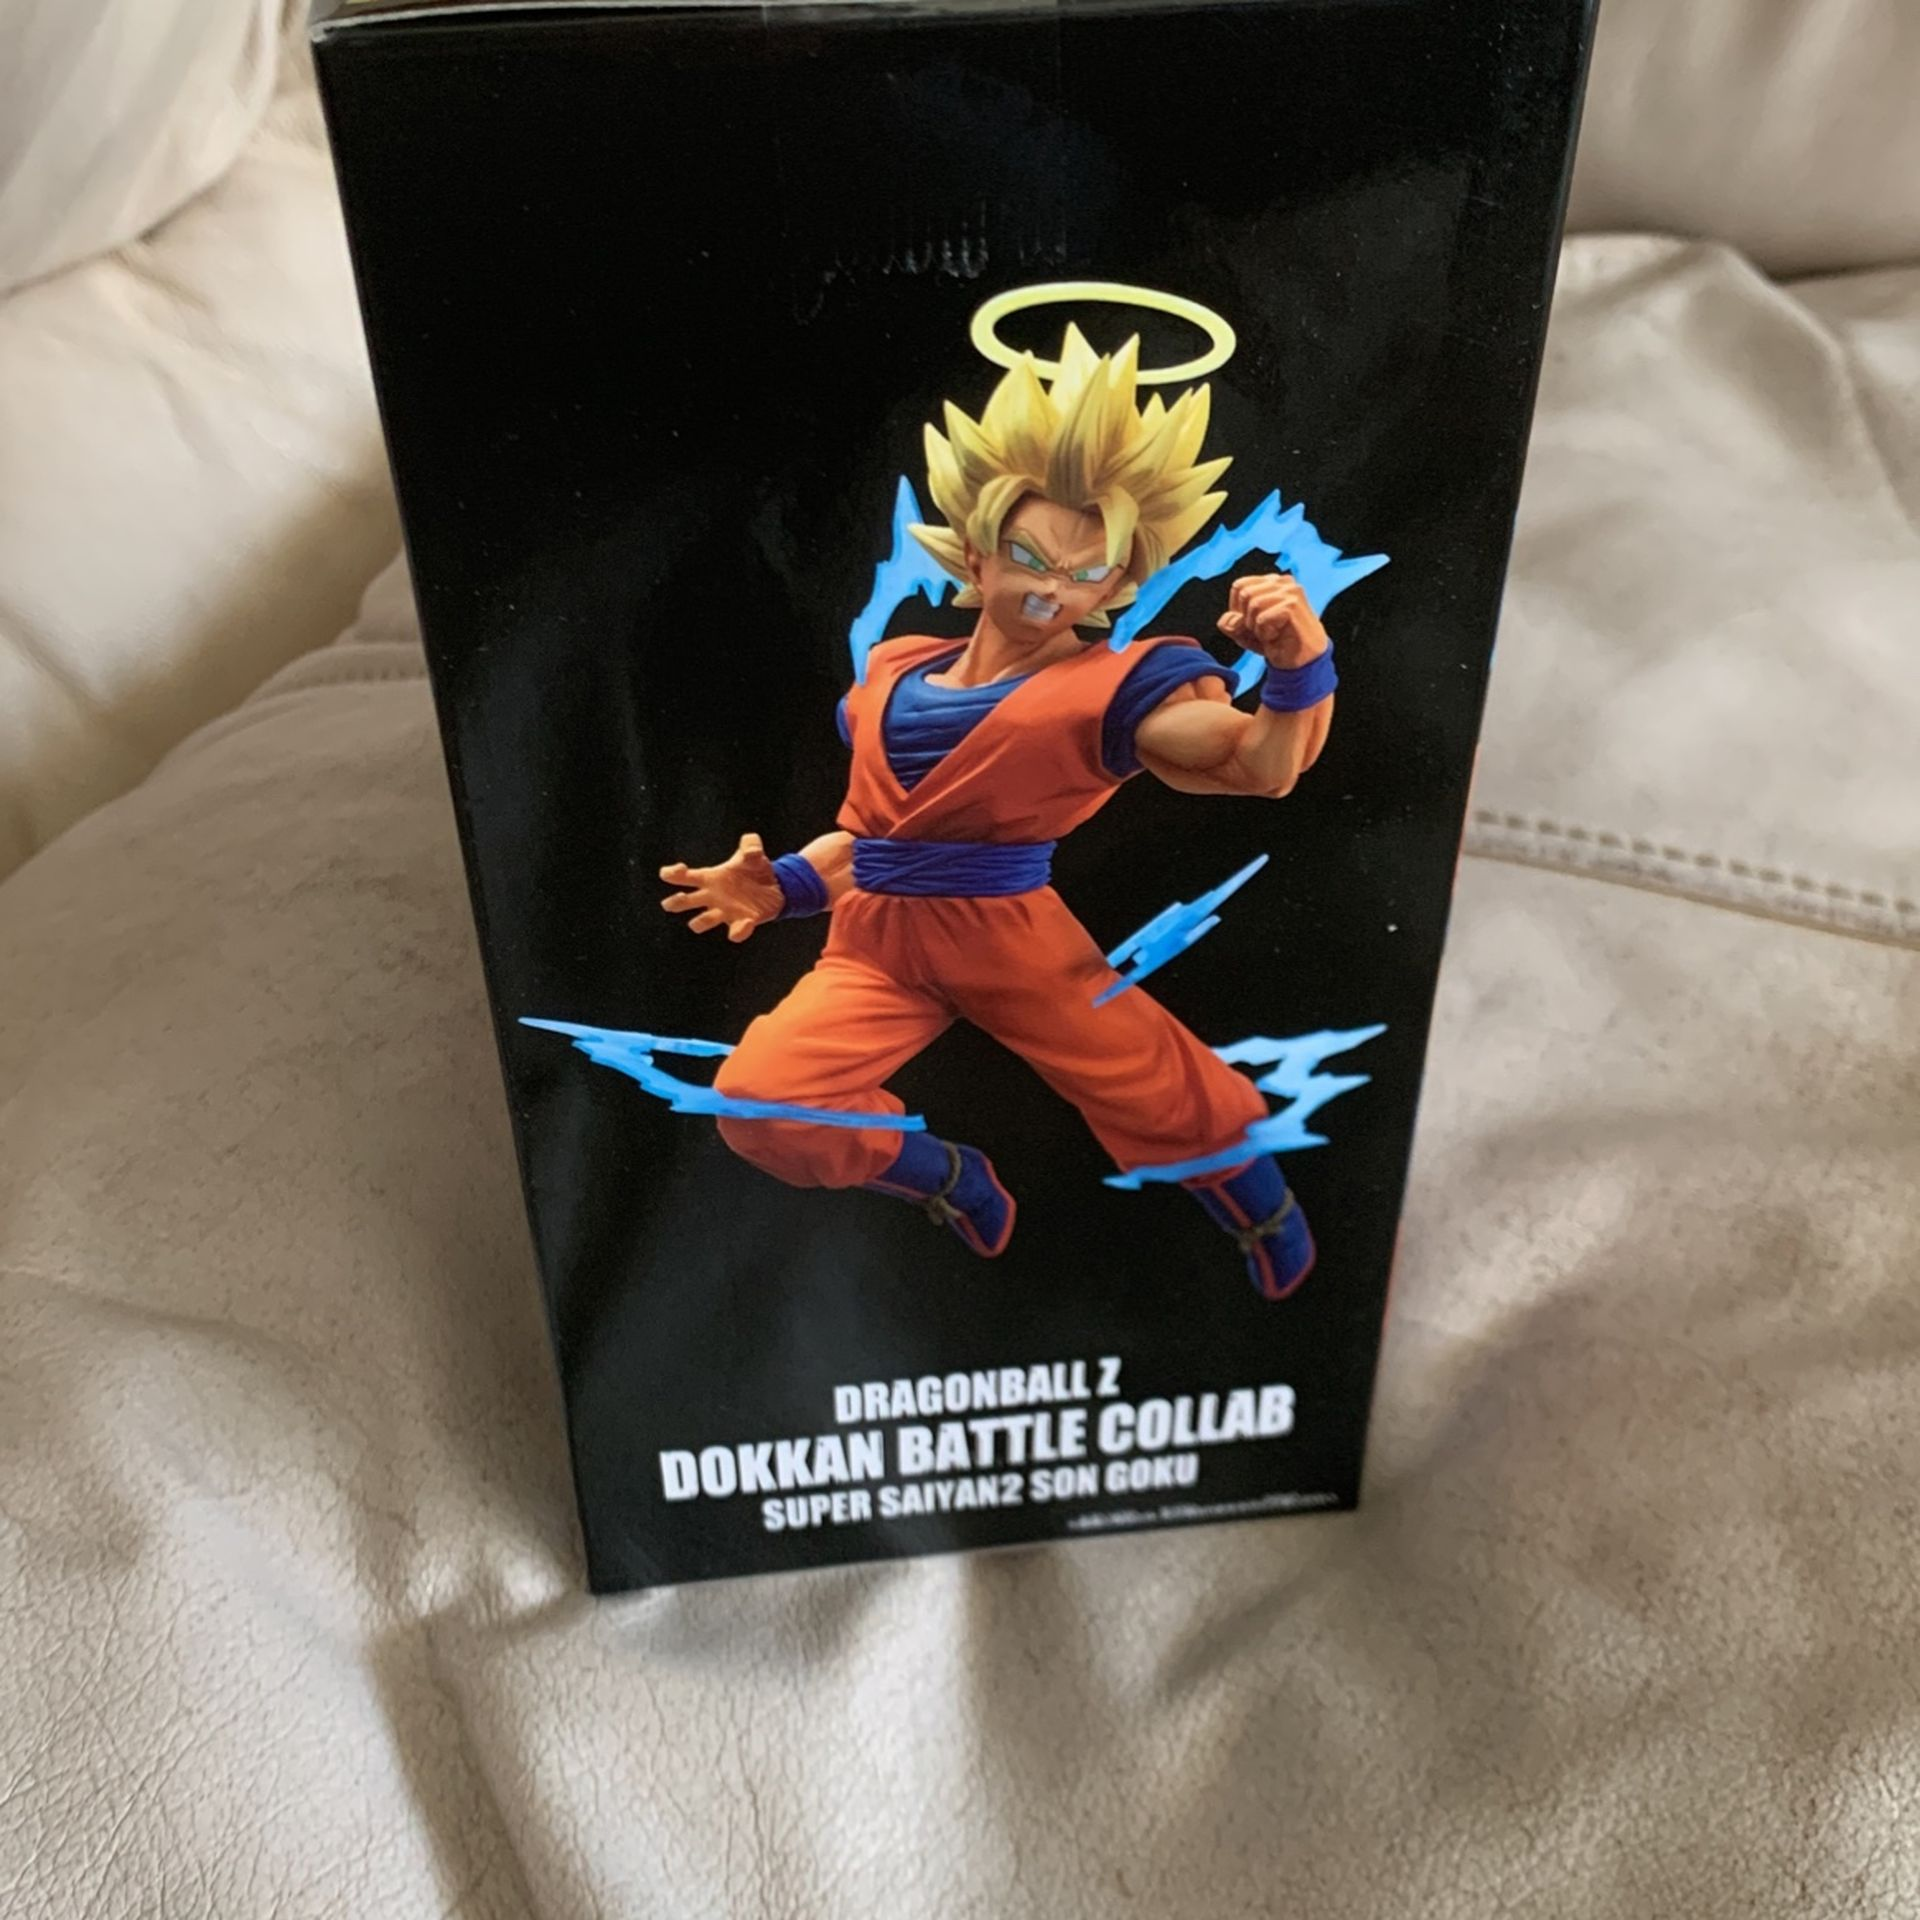 Dragonball Z Super Saiyan2 Son Goku